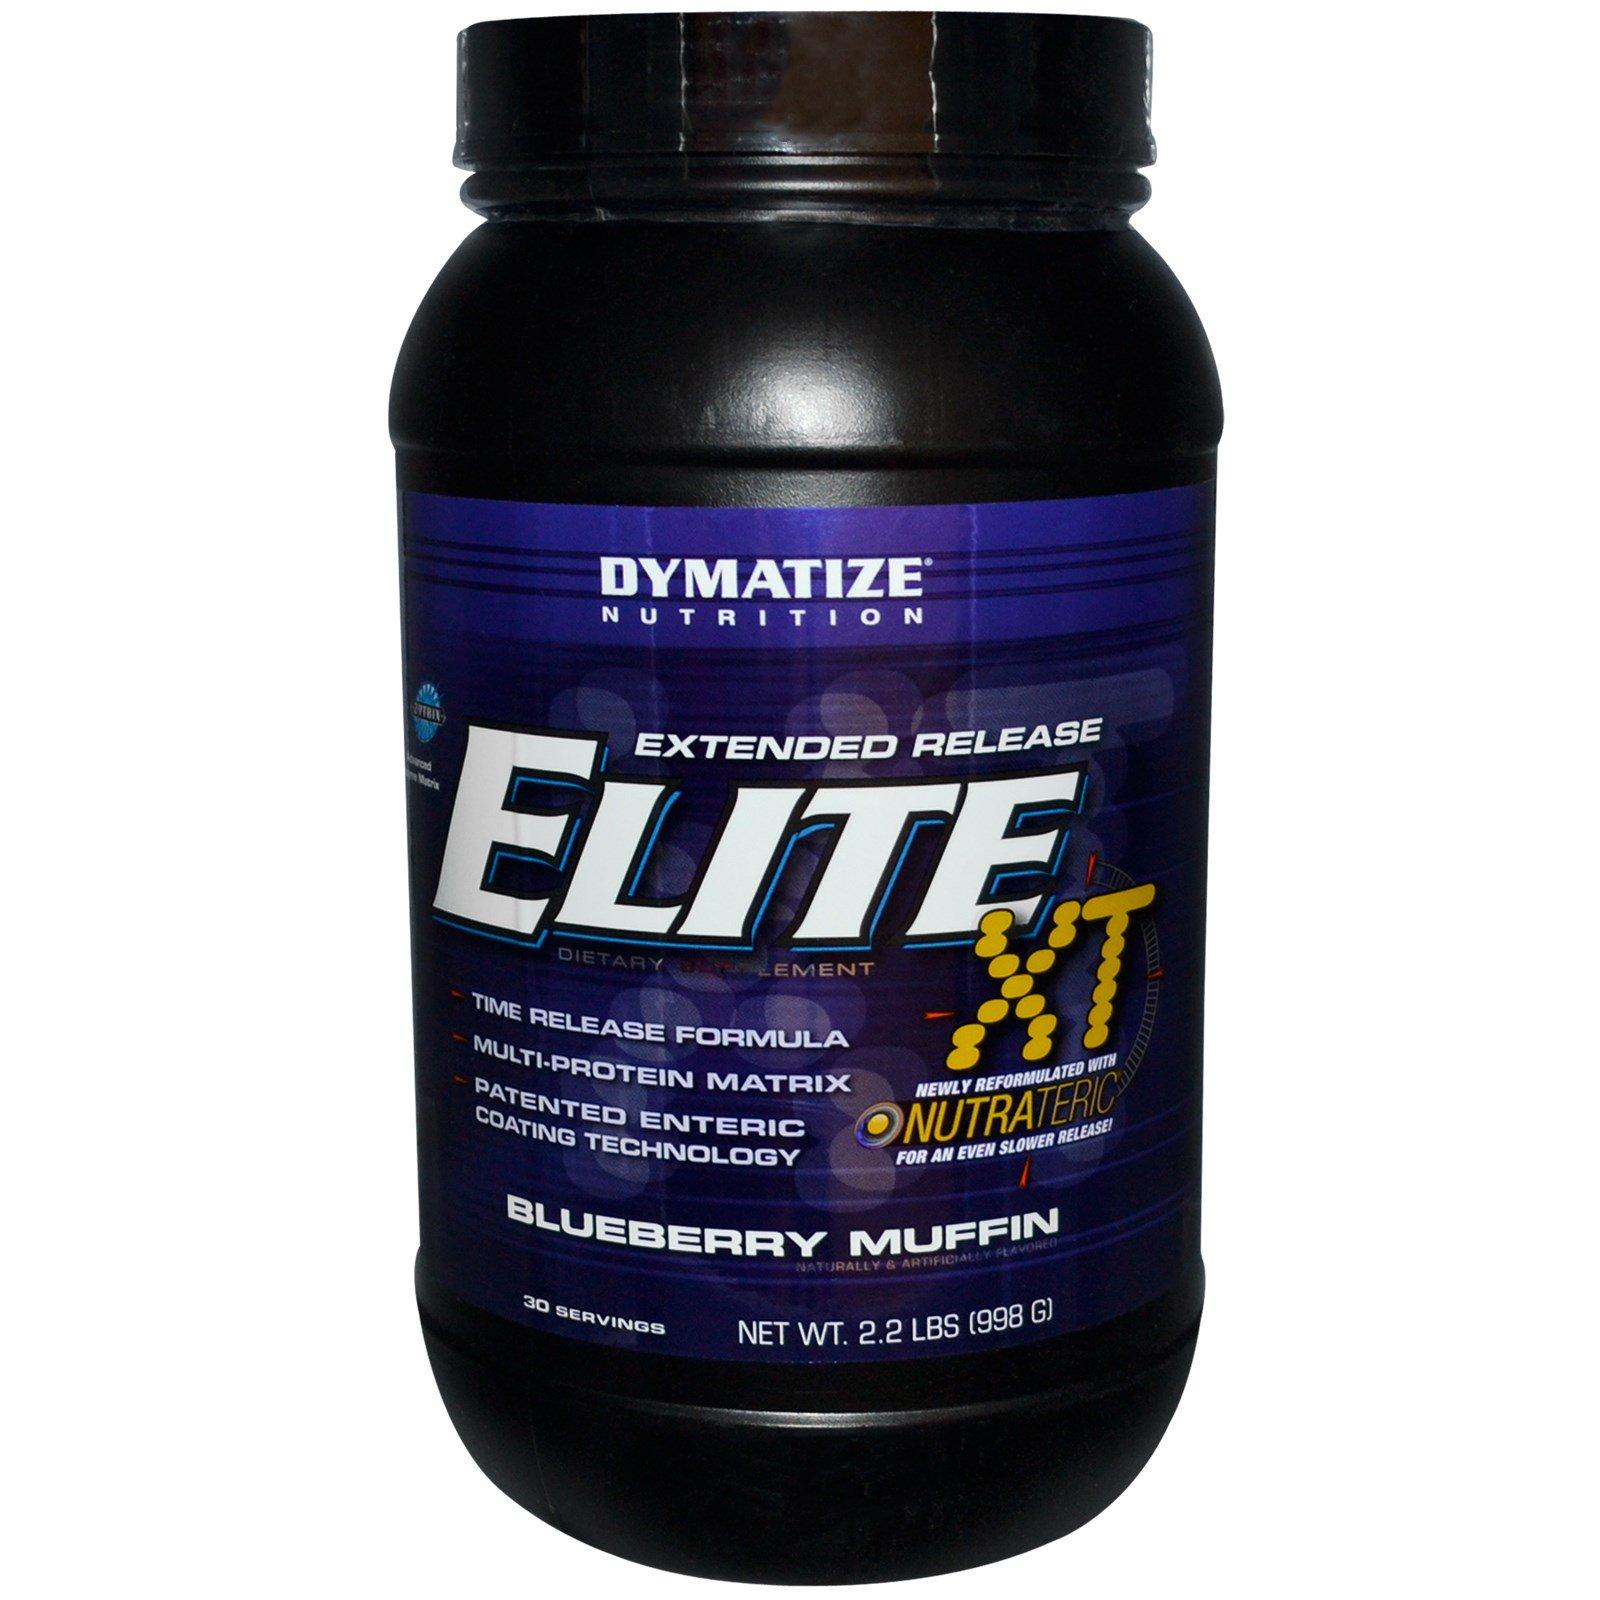 Dymatize elite xt extended release